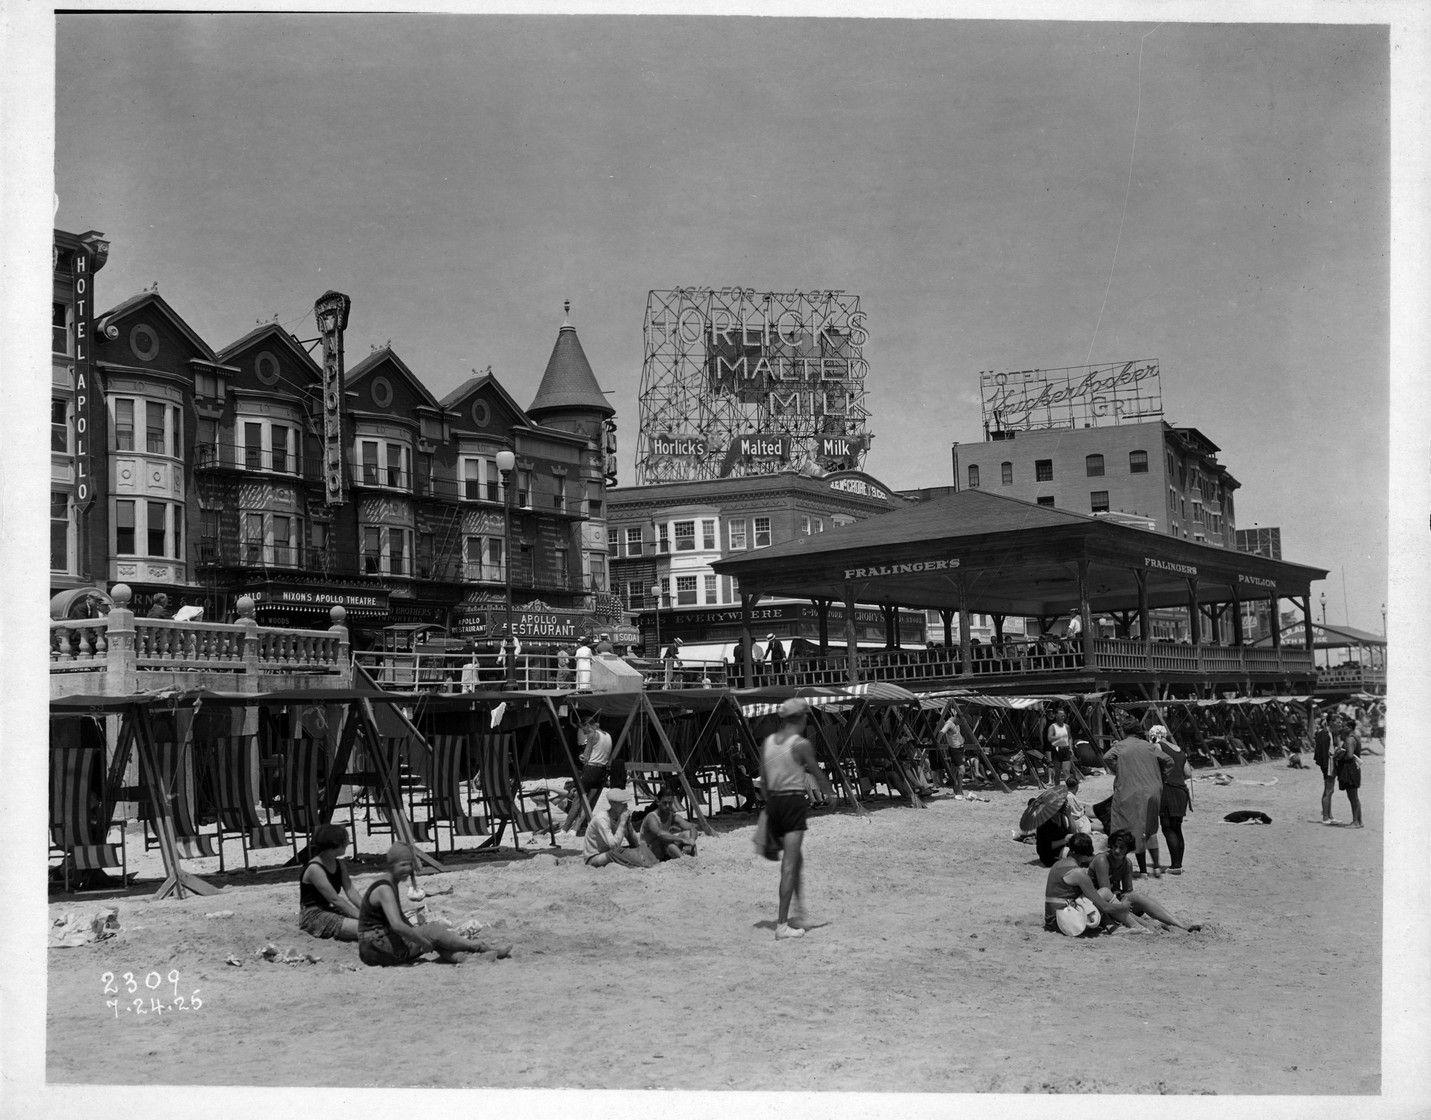 Atlantic City Boardwalk   Atlantic City Early Th Century